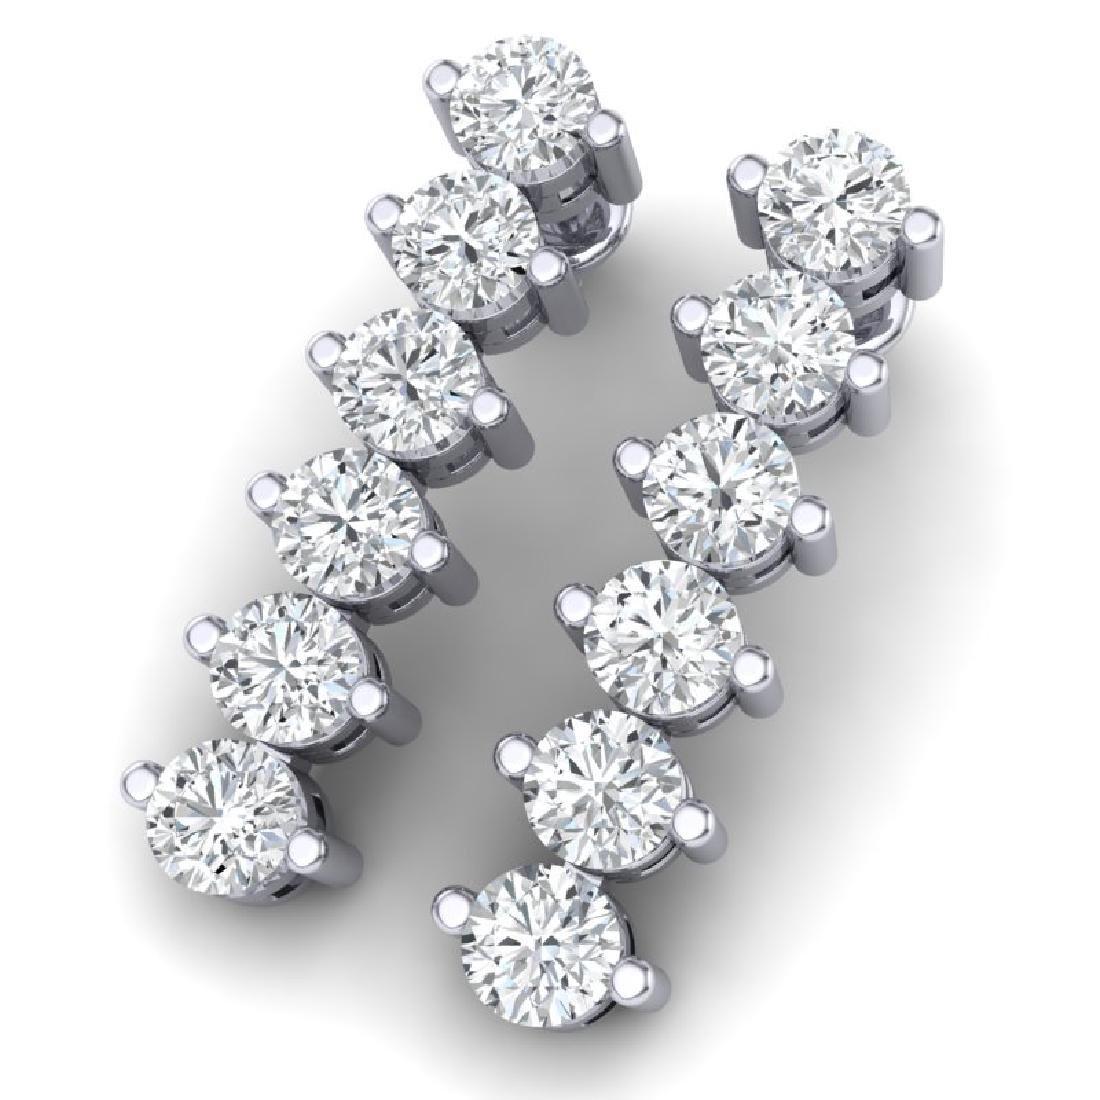 3 CTW Certified VS/SI Diamond Earrings 18K White Gold